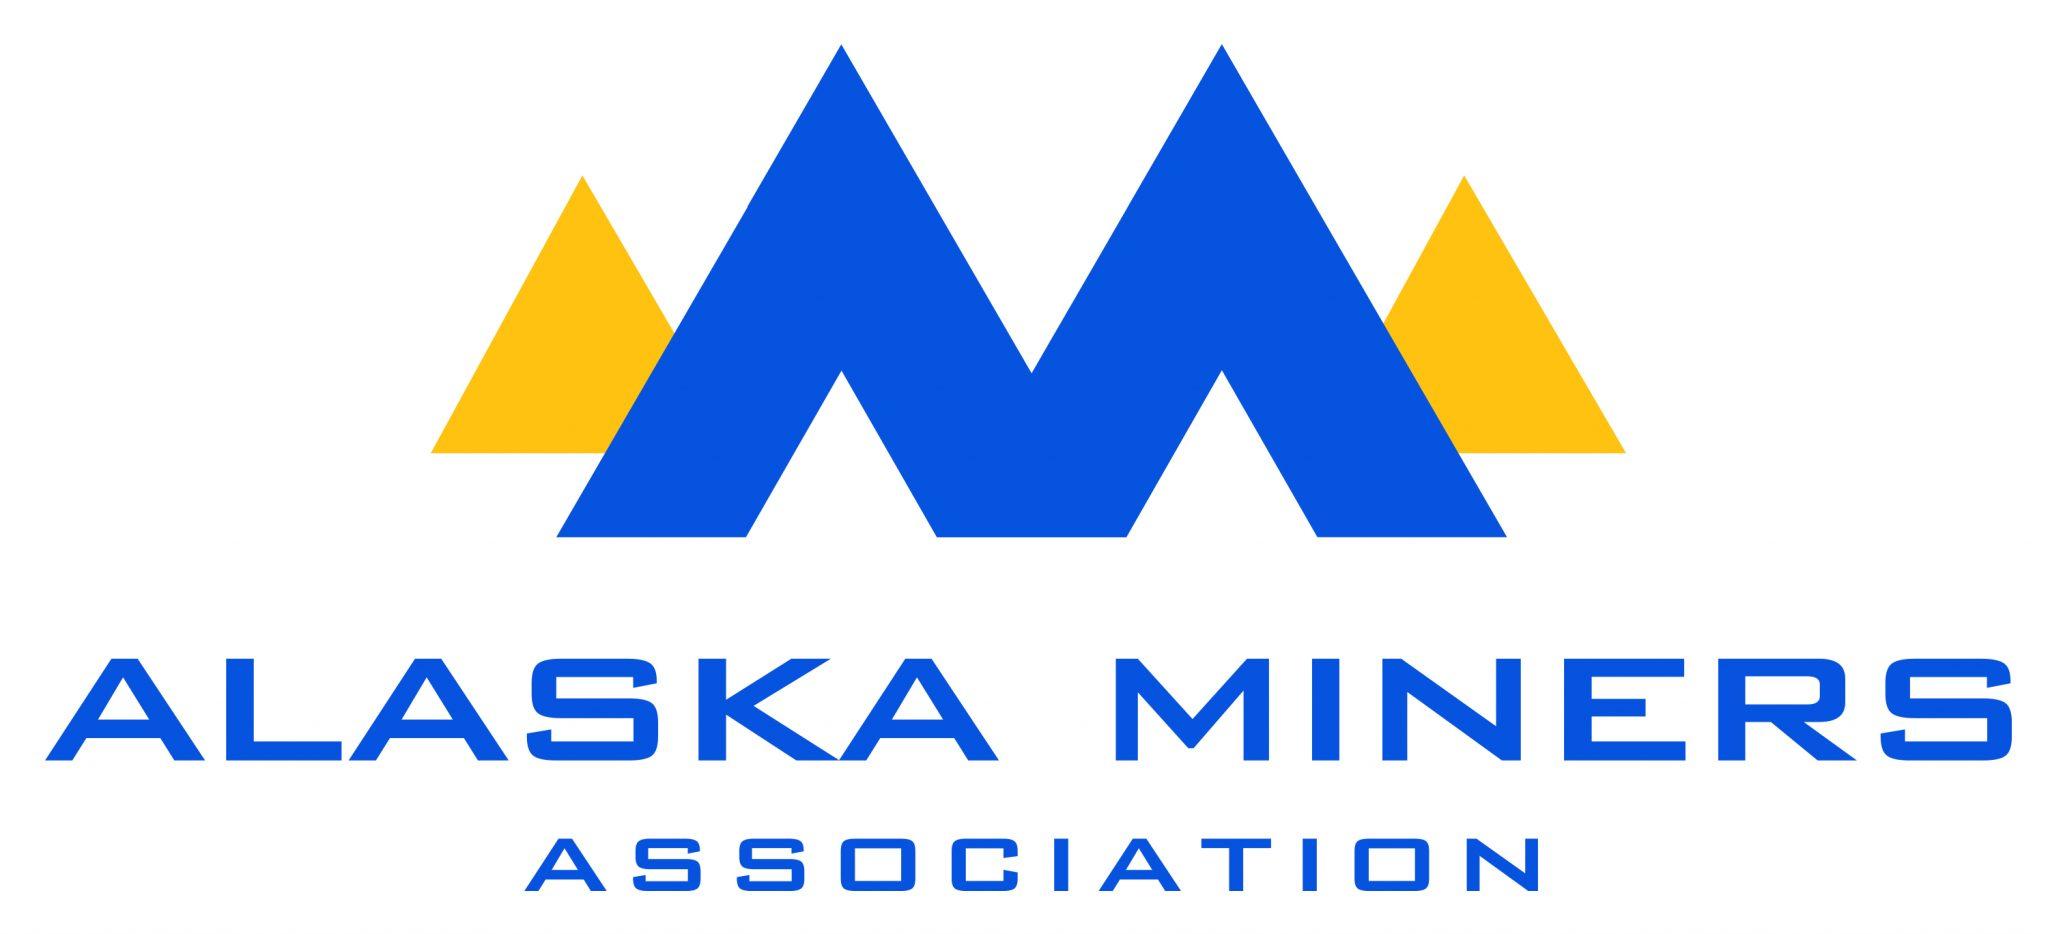 Alaska Miners